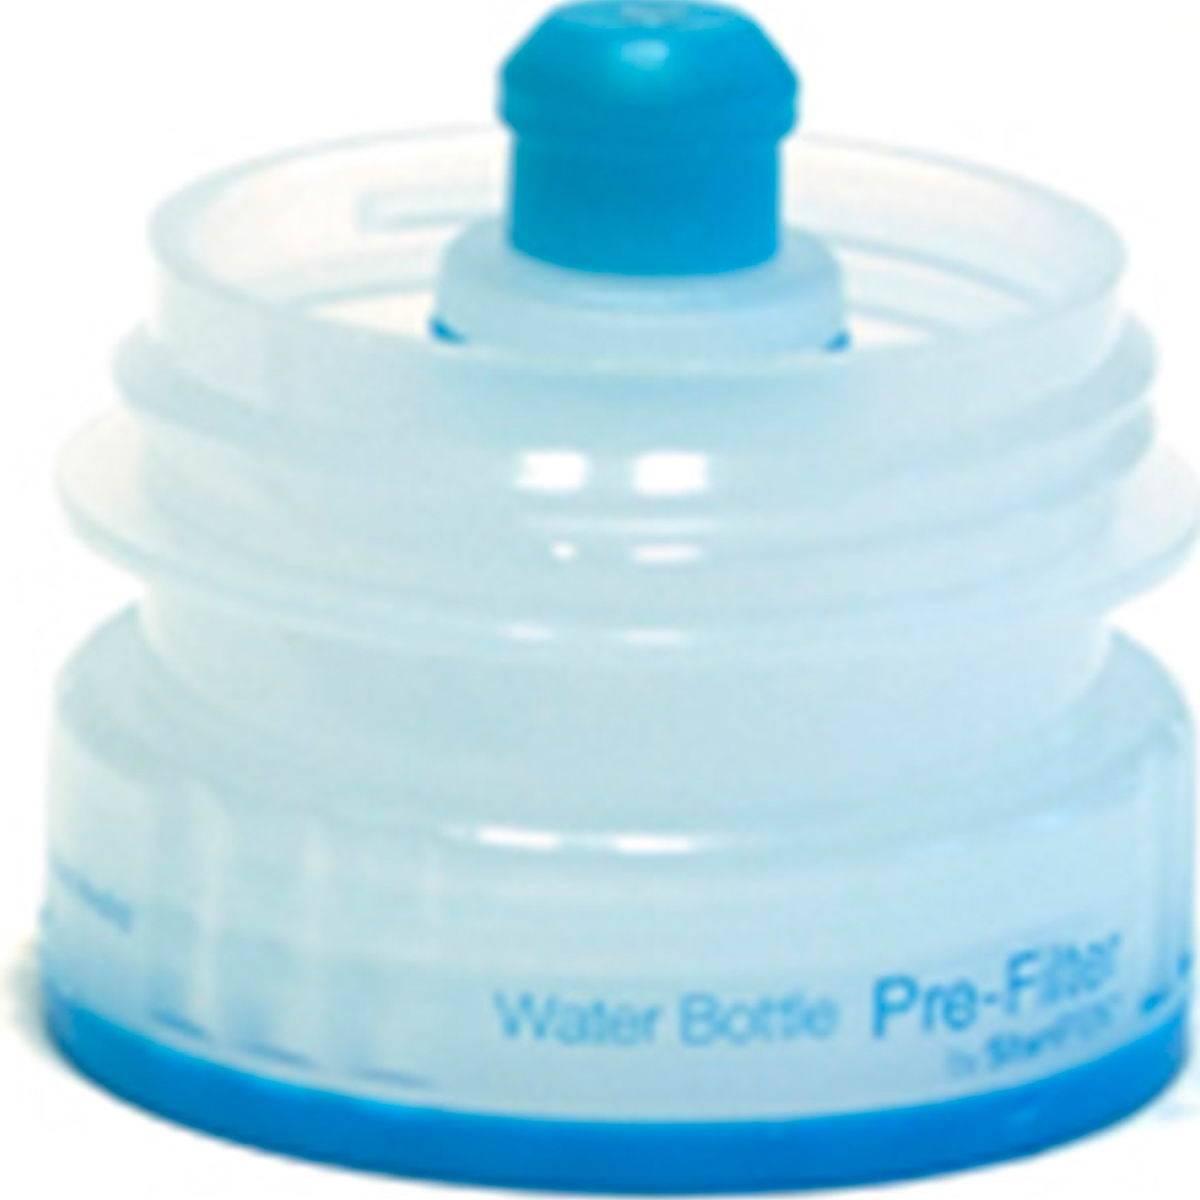 SteriPEN Water Bottle Pre-Filter - Grobfilter - Bild 1